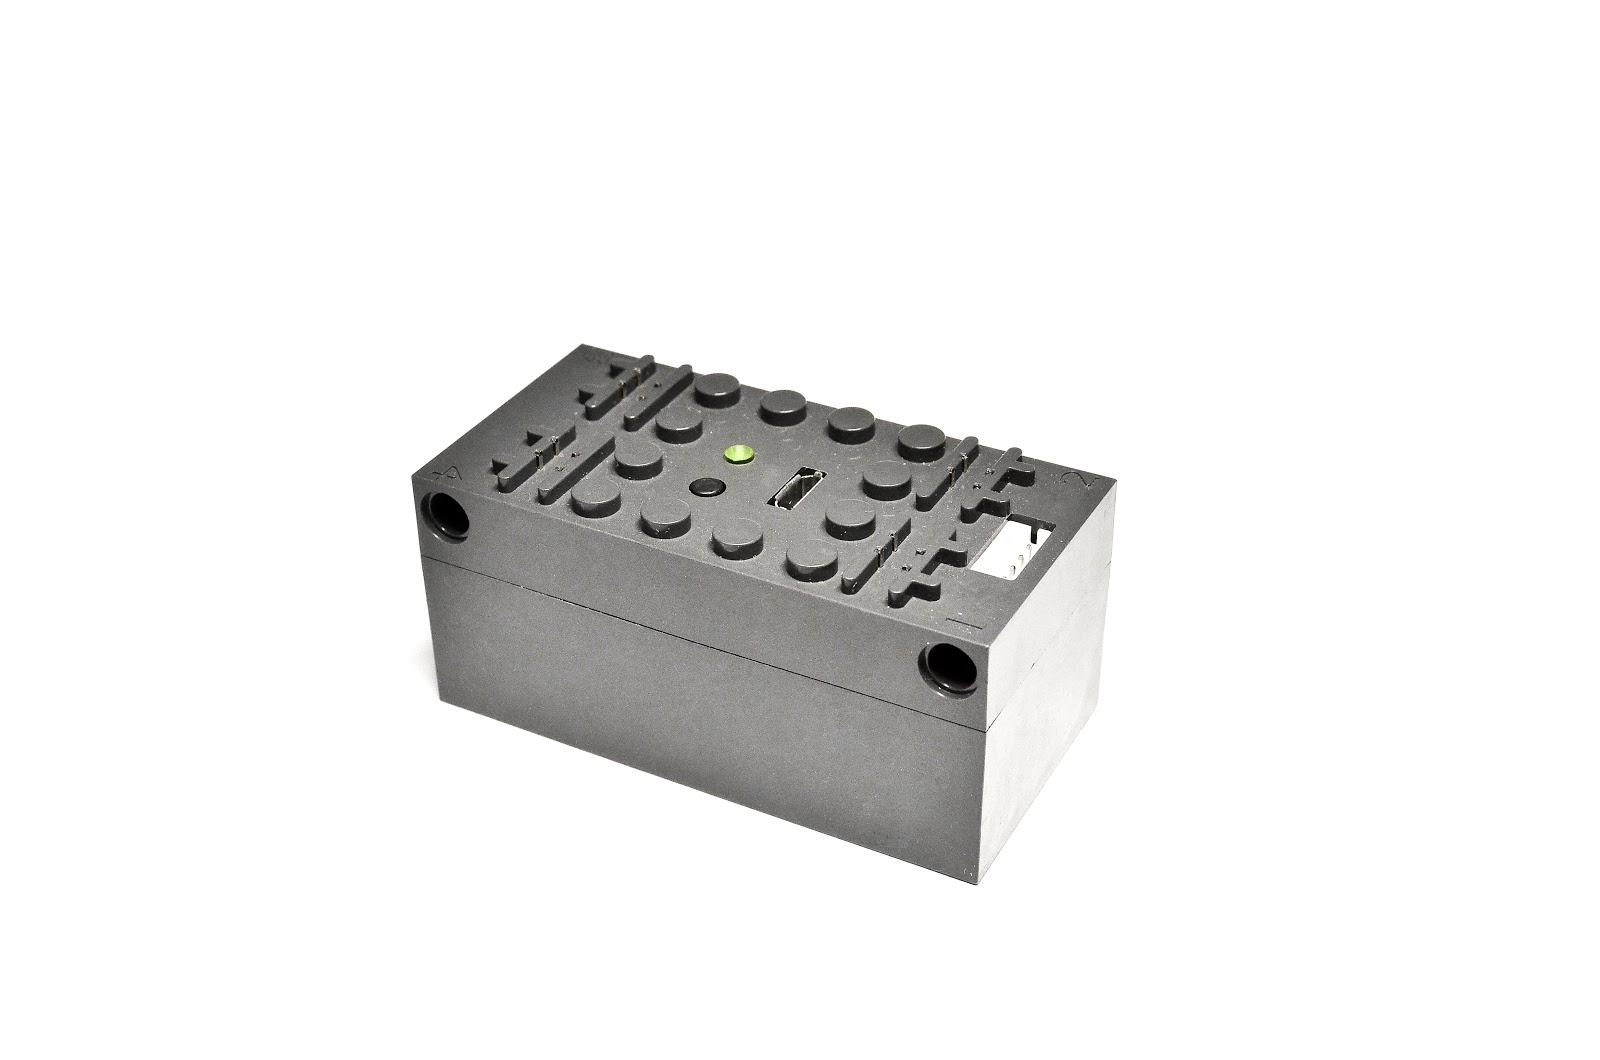 Lego-Suzuki-Jimny-2019-35